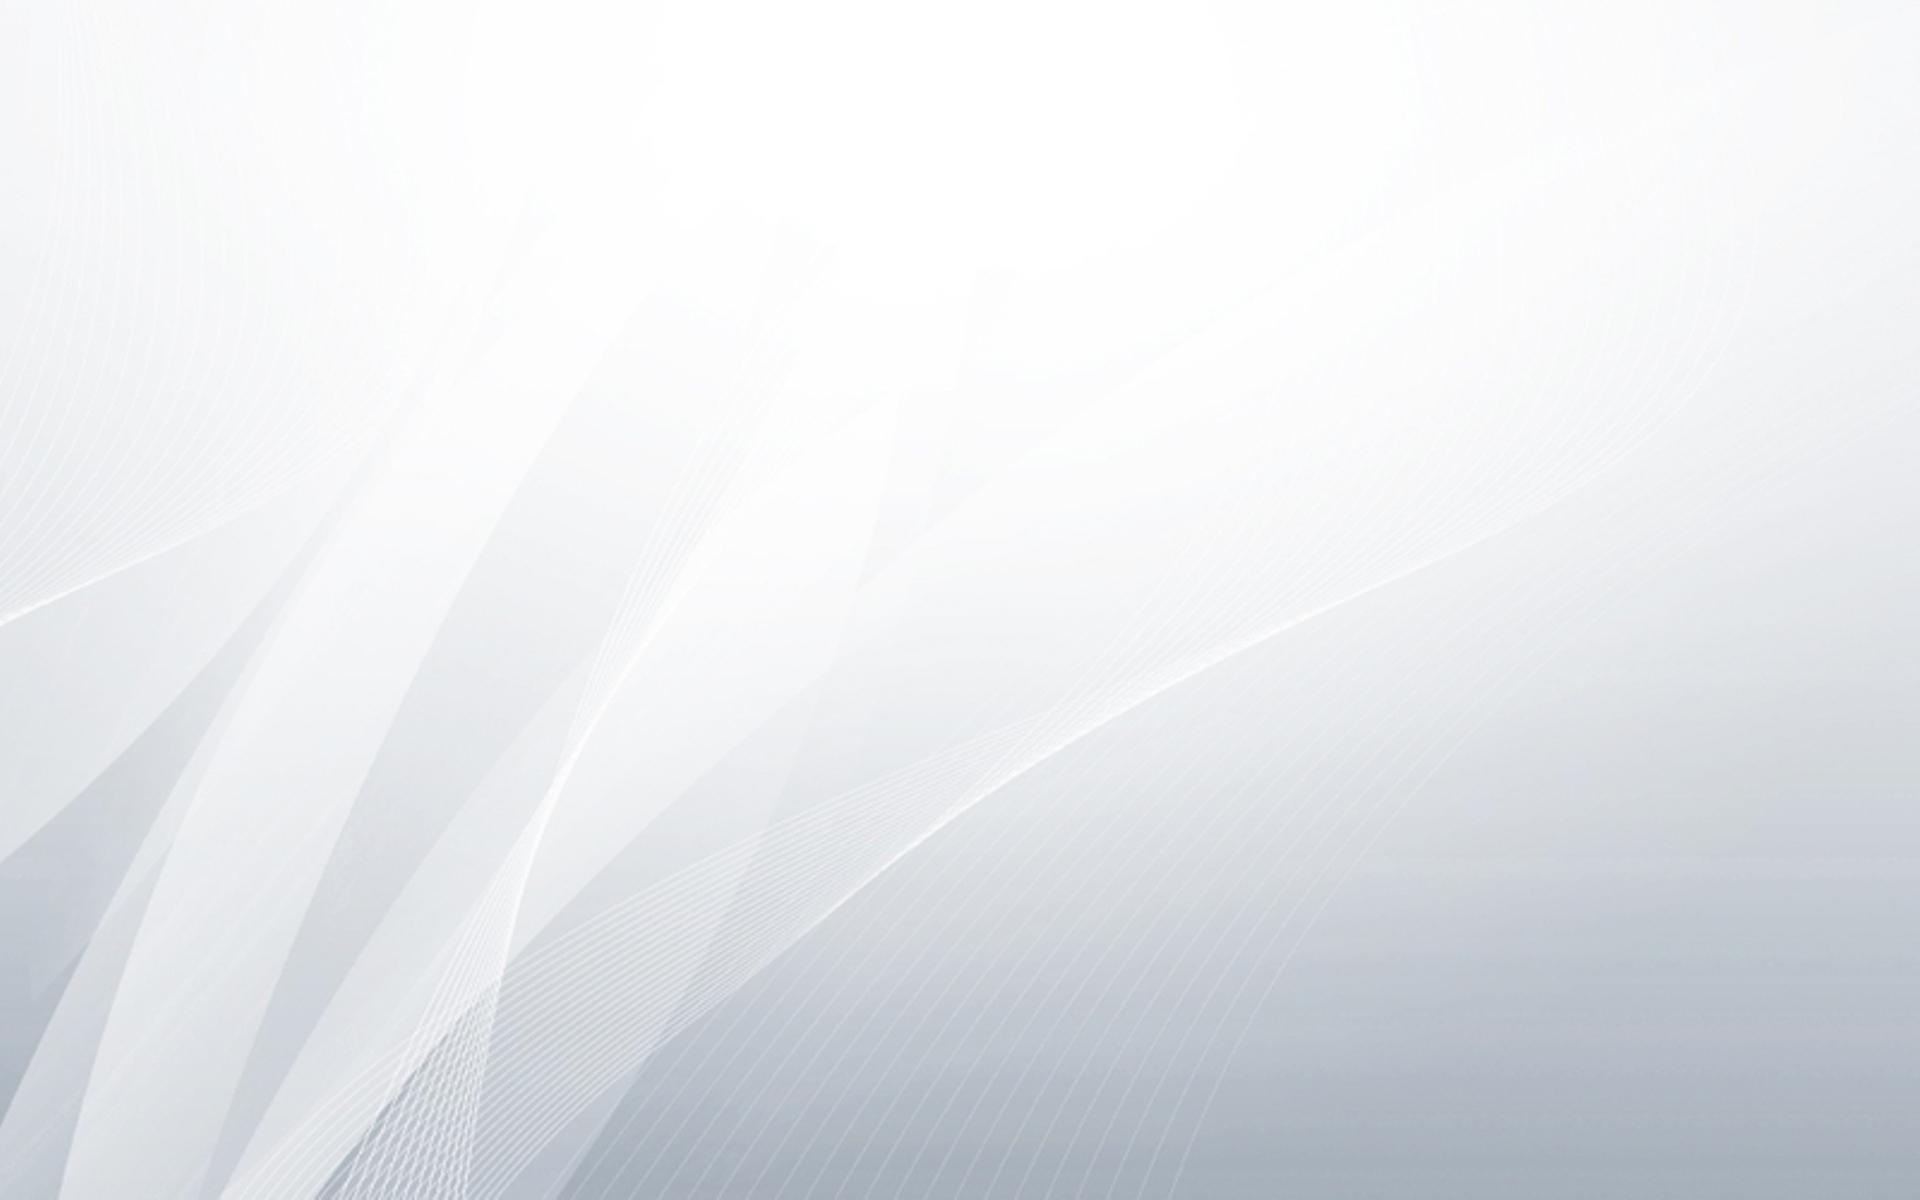 White Abstract HD Pics